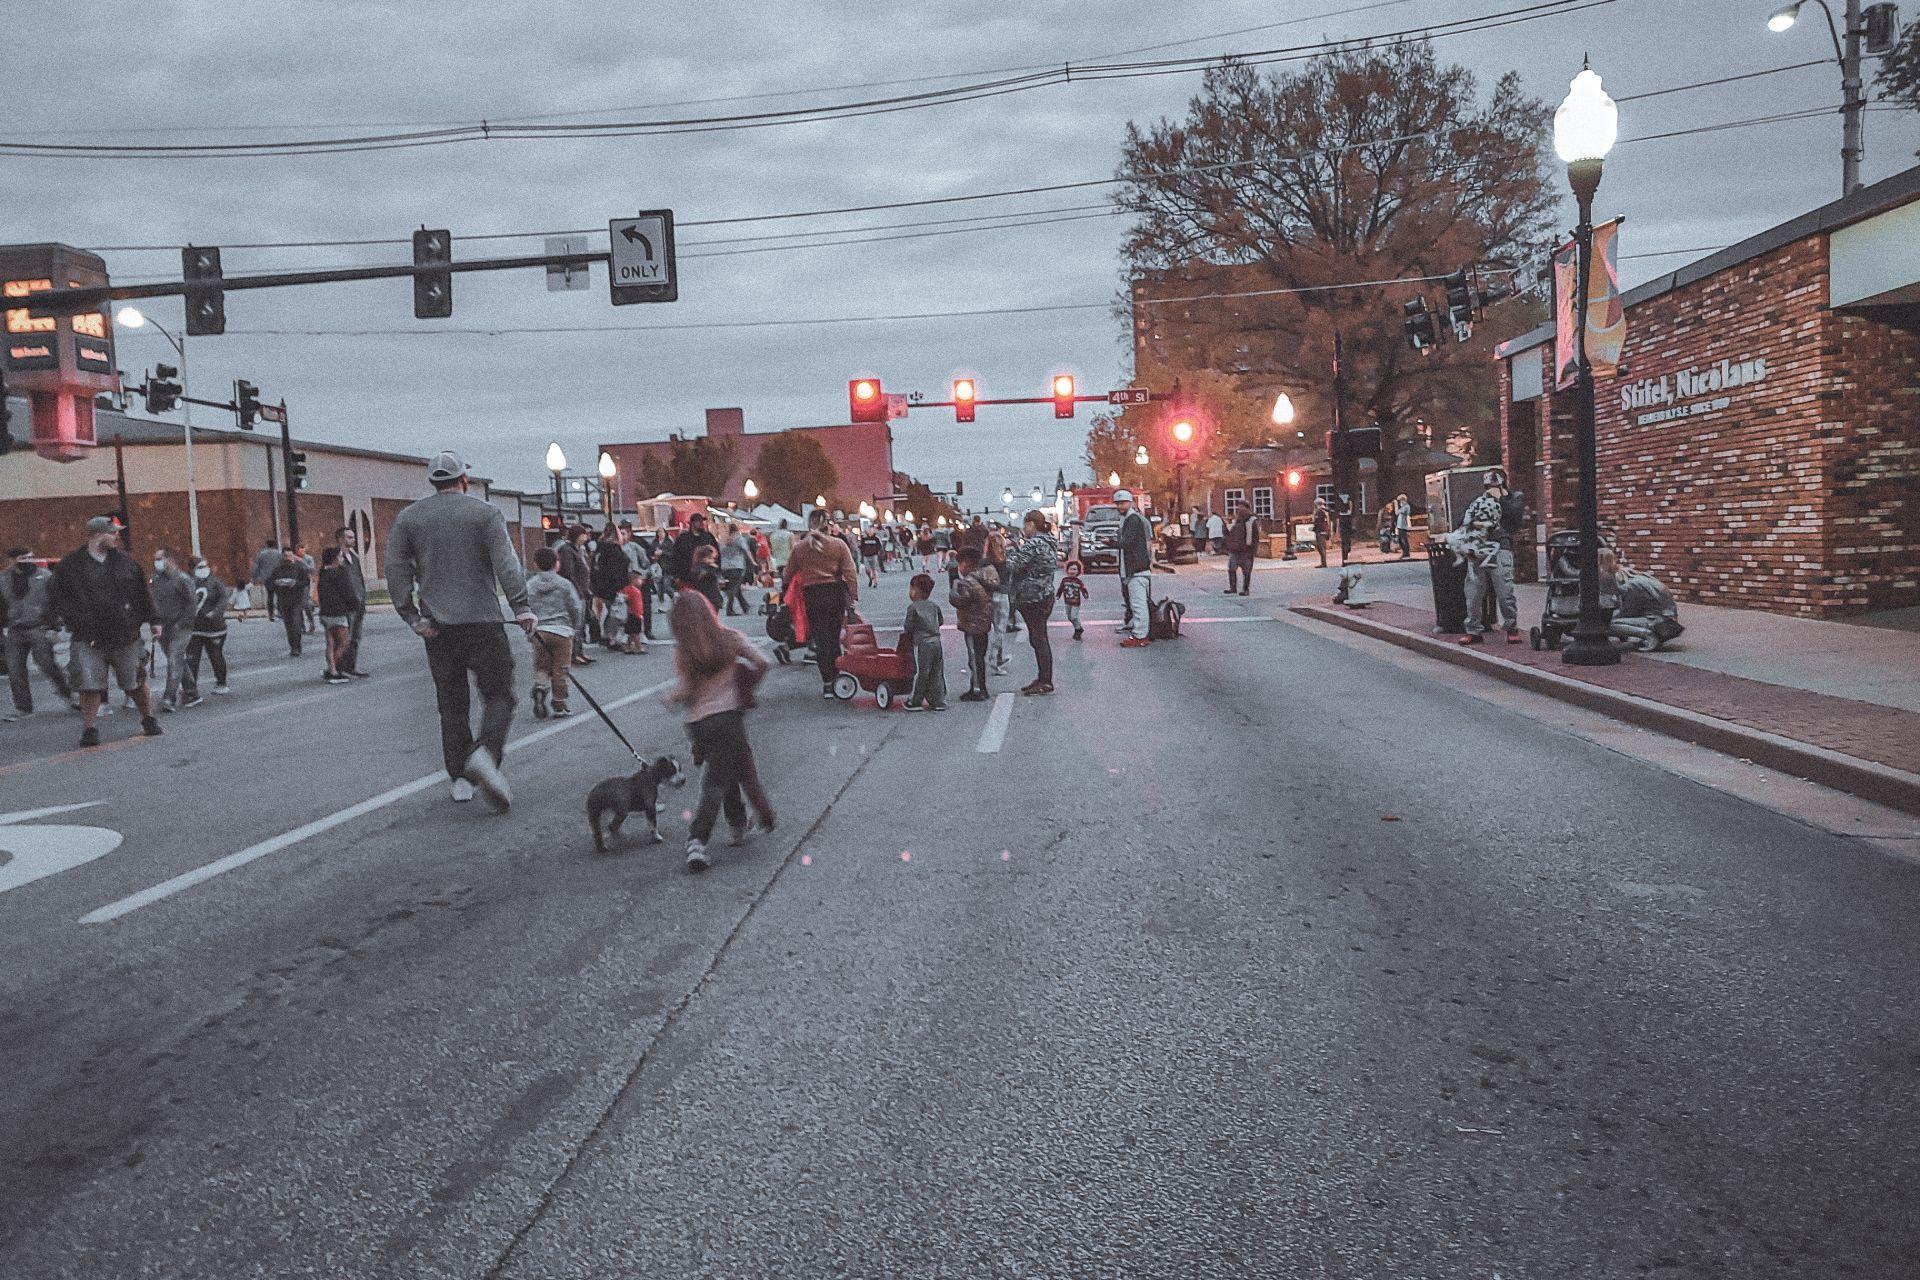 Third Thursday comes back to Joplin. 12